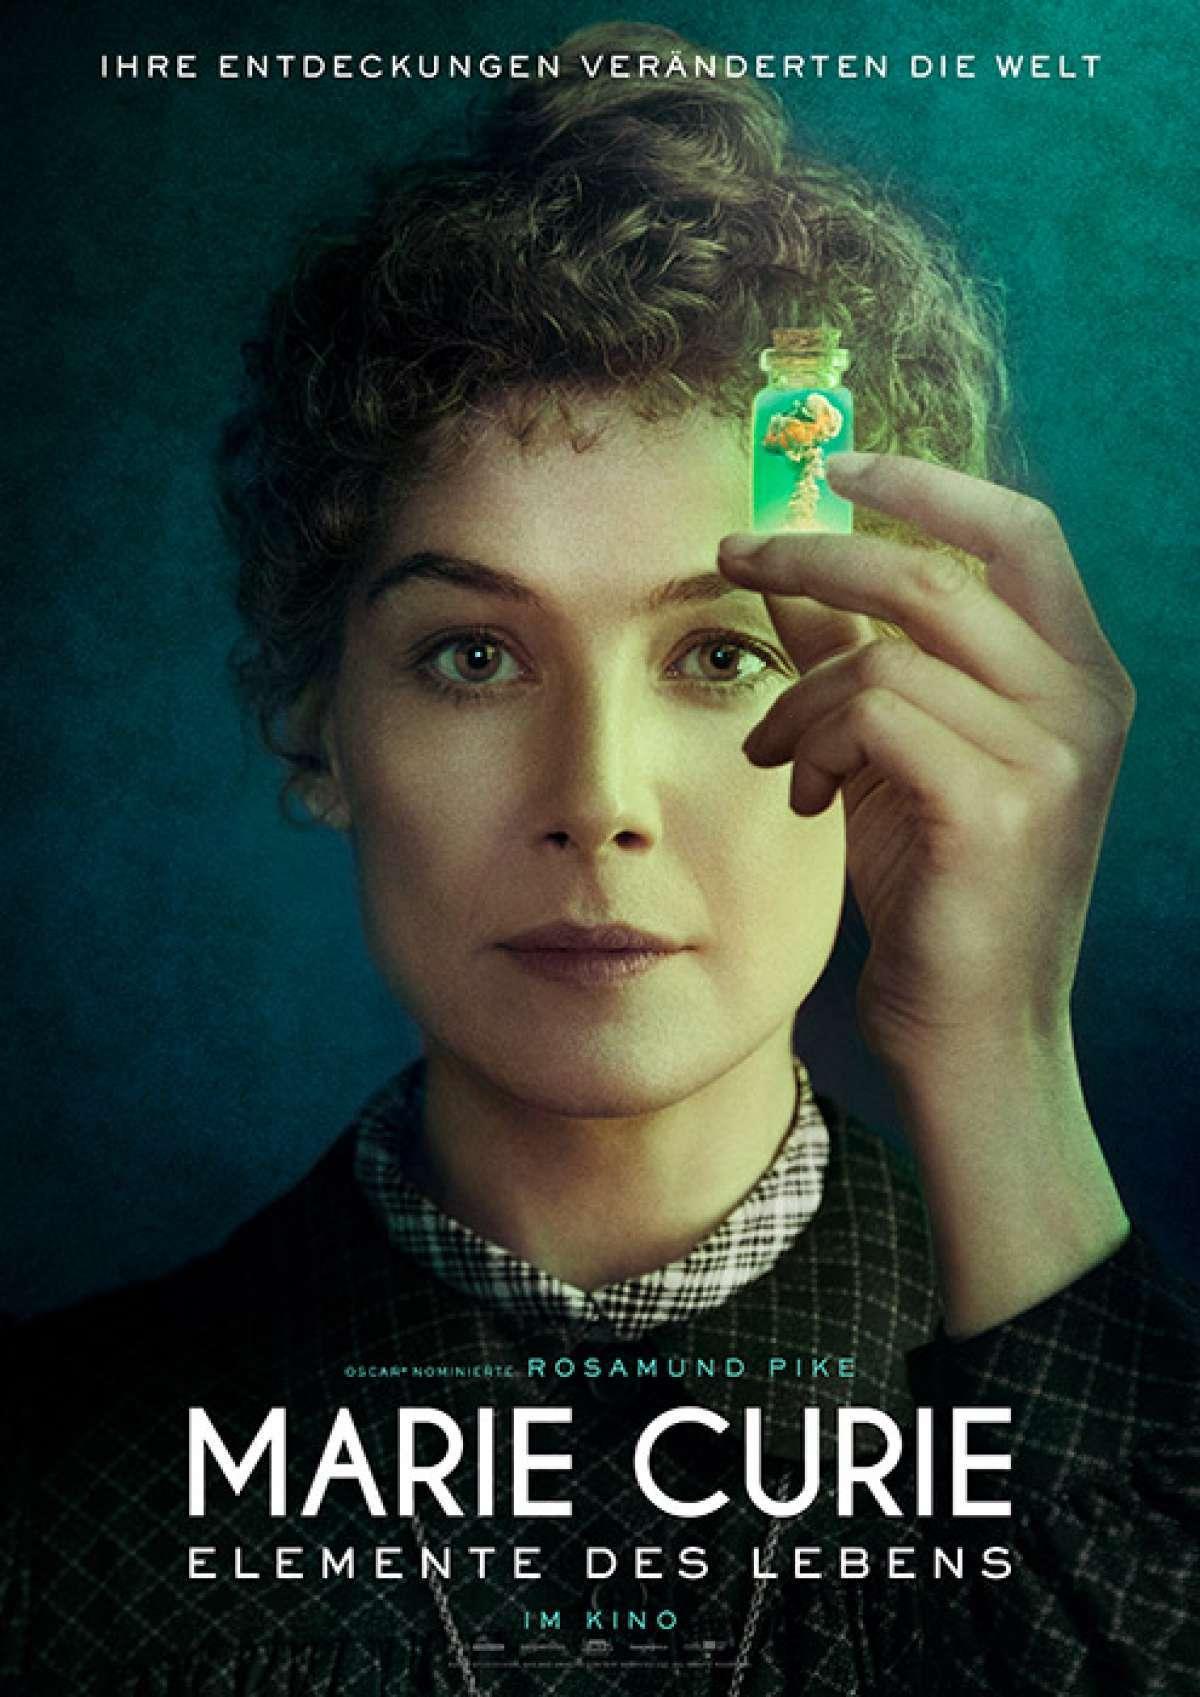 Marie Curie - Elemente des Lebens - Pollux by Cineplex  - Paderborn